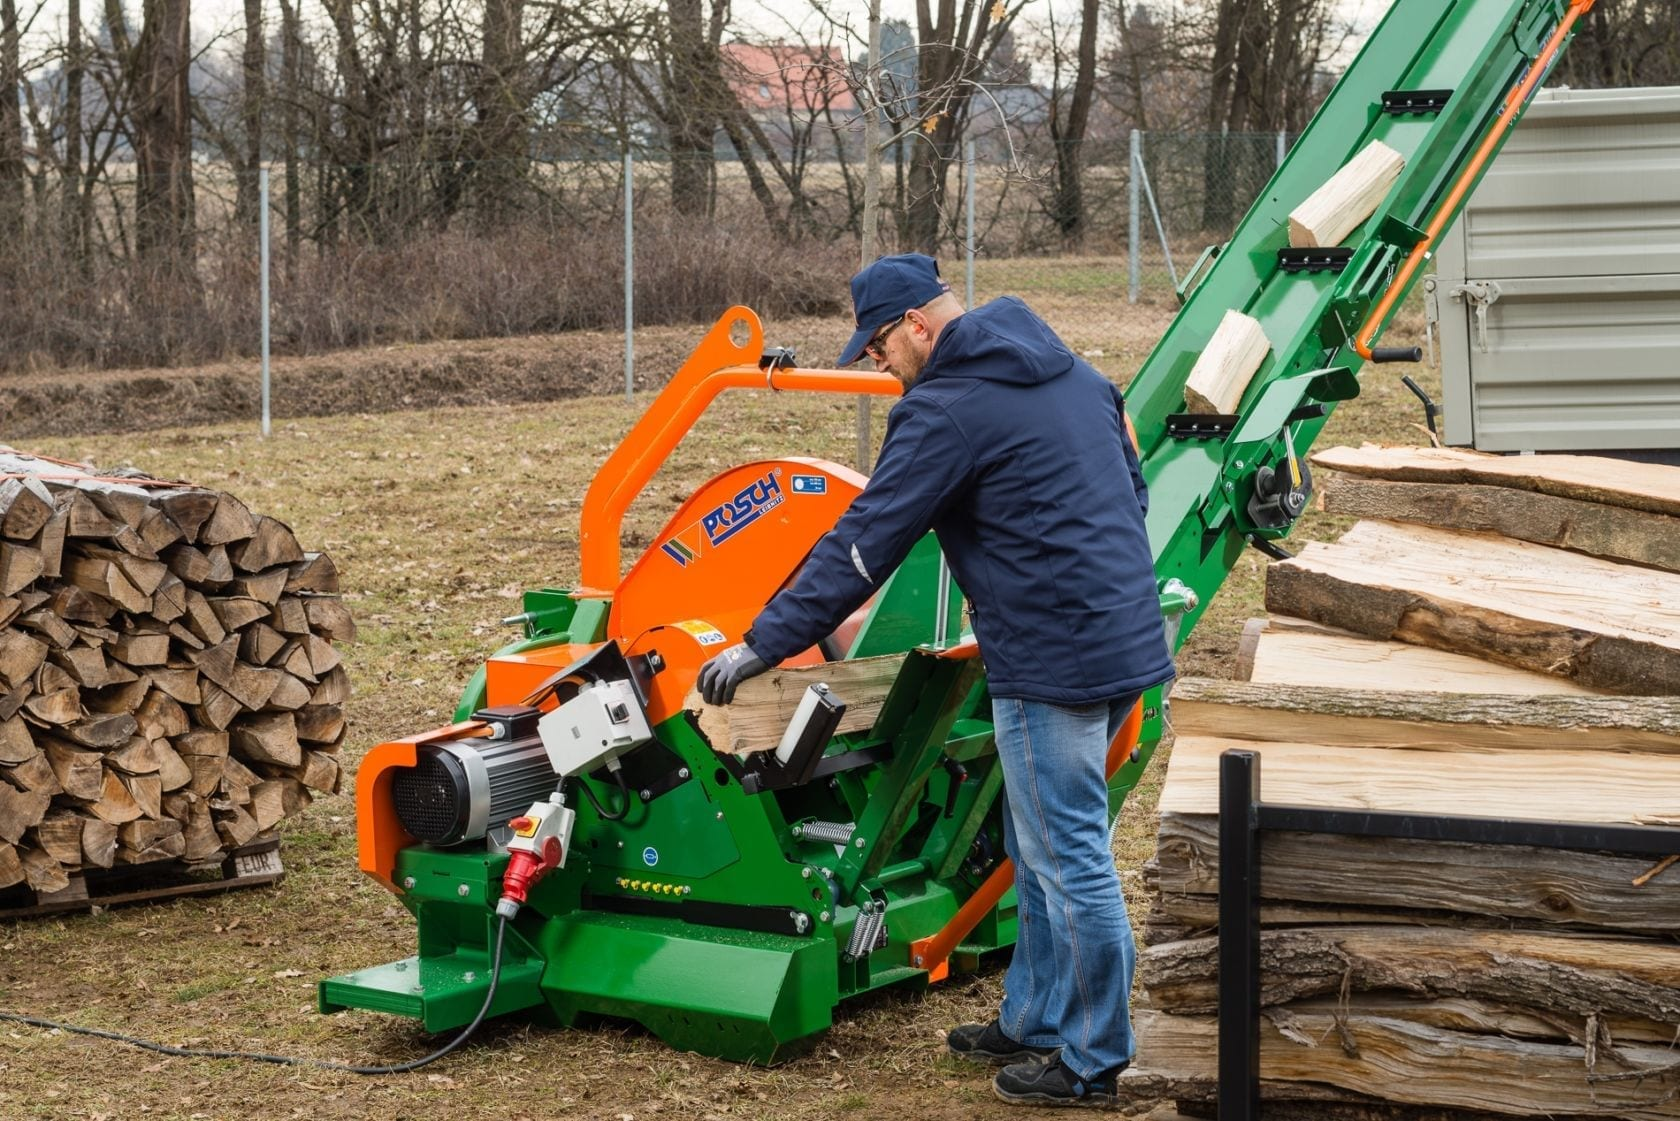 Tilting log saw with conveyor belt, conveyor belt saw, Posch